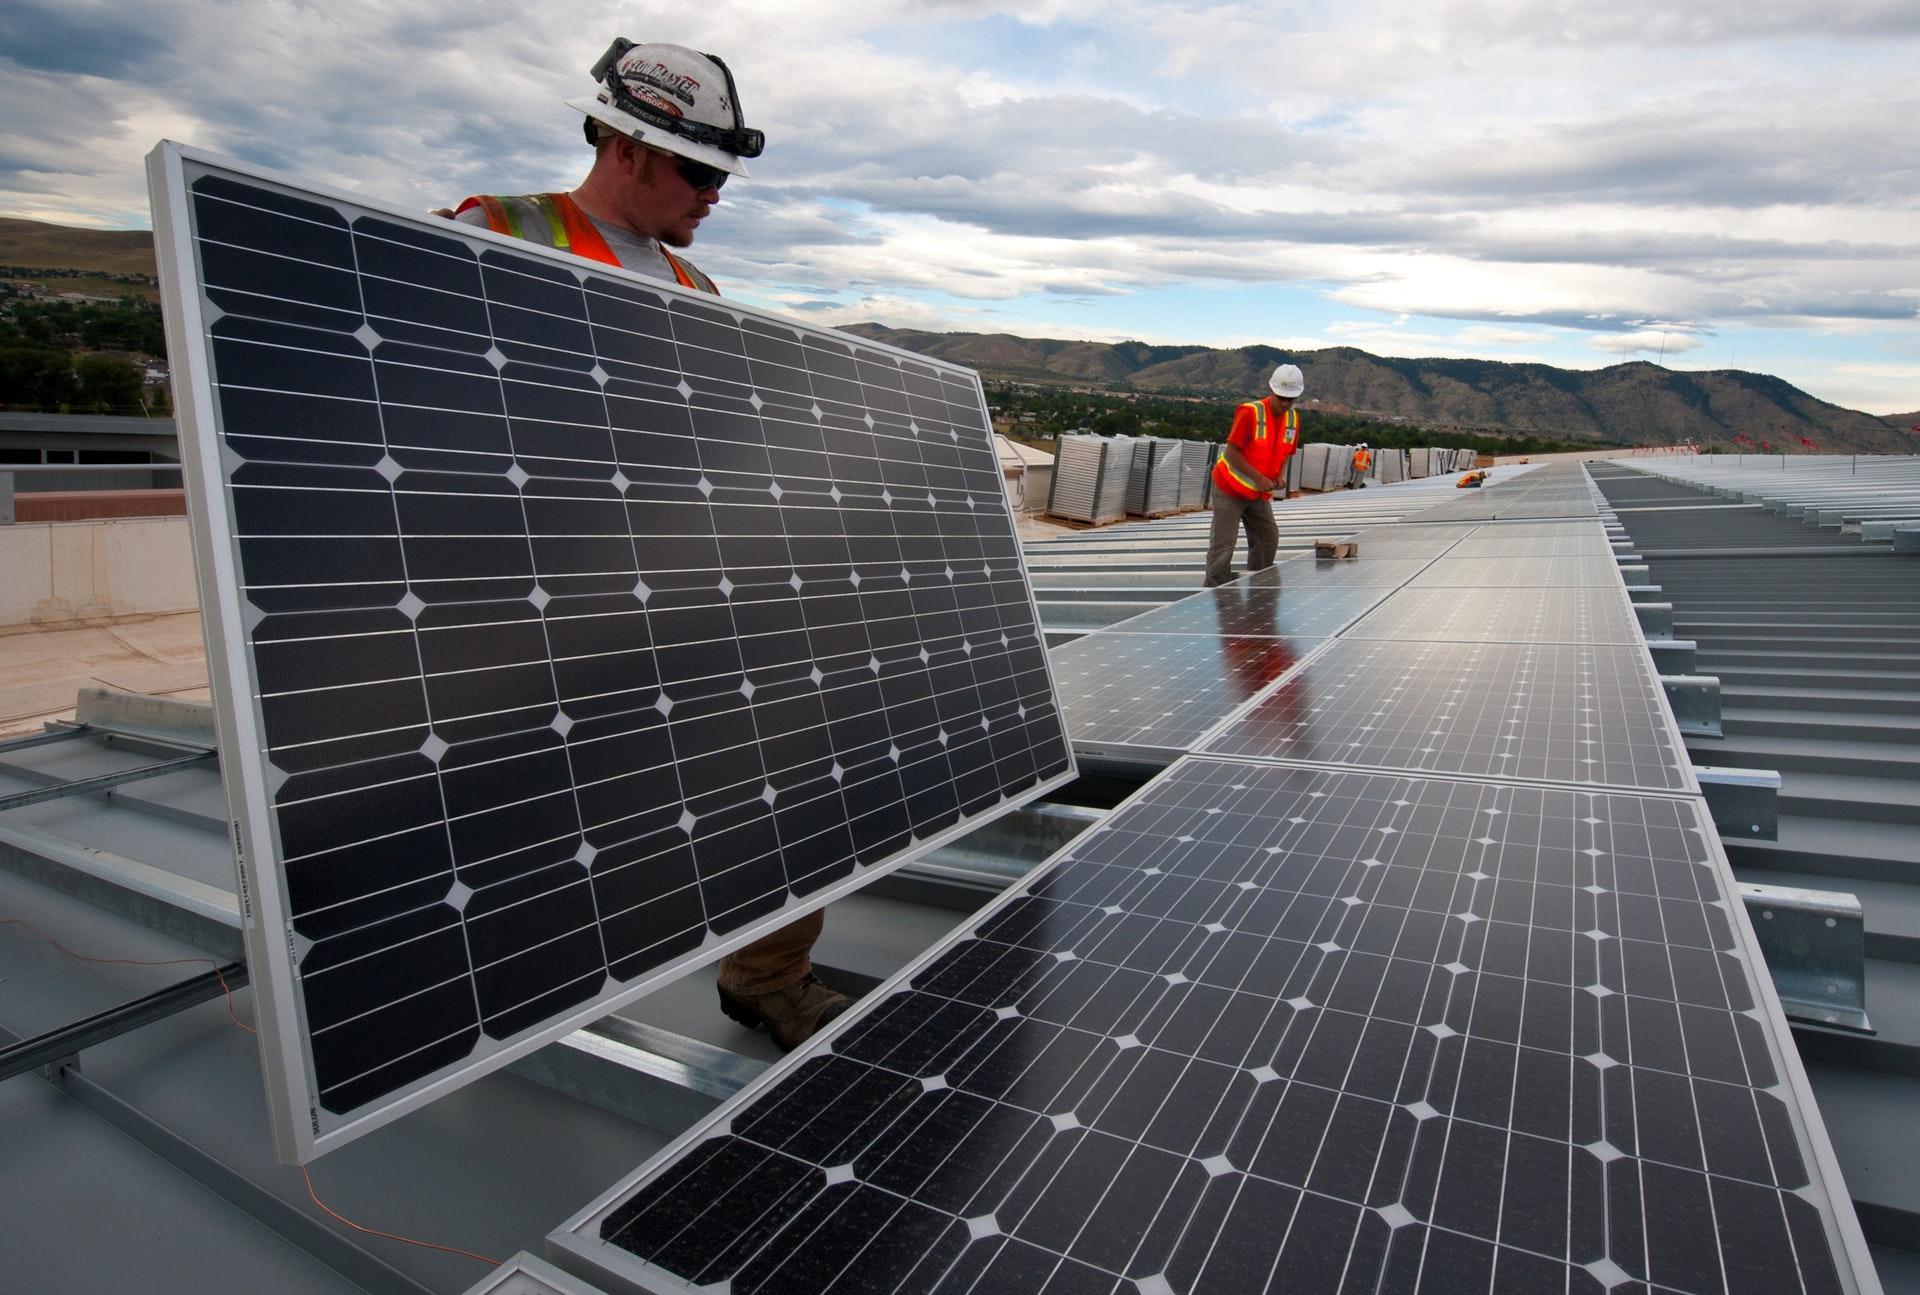 energia solar santander financiamento agronegócio